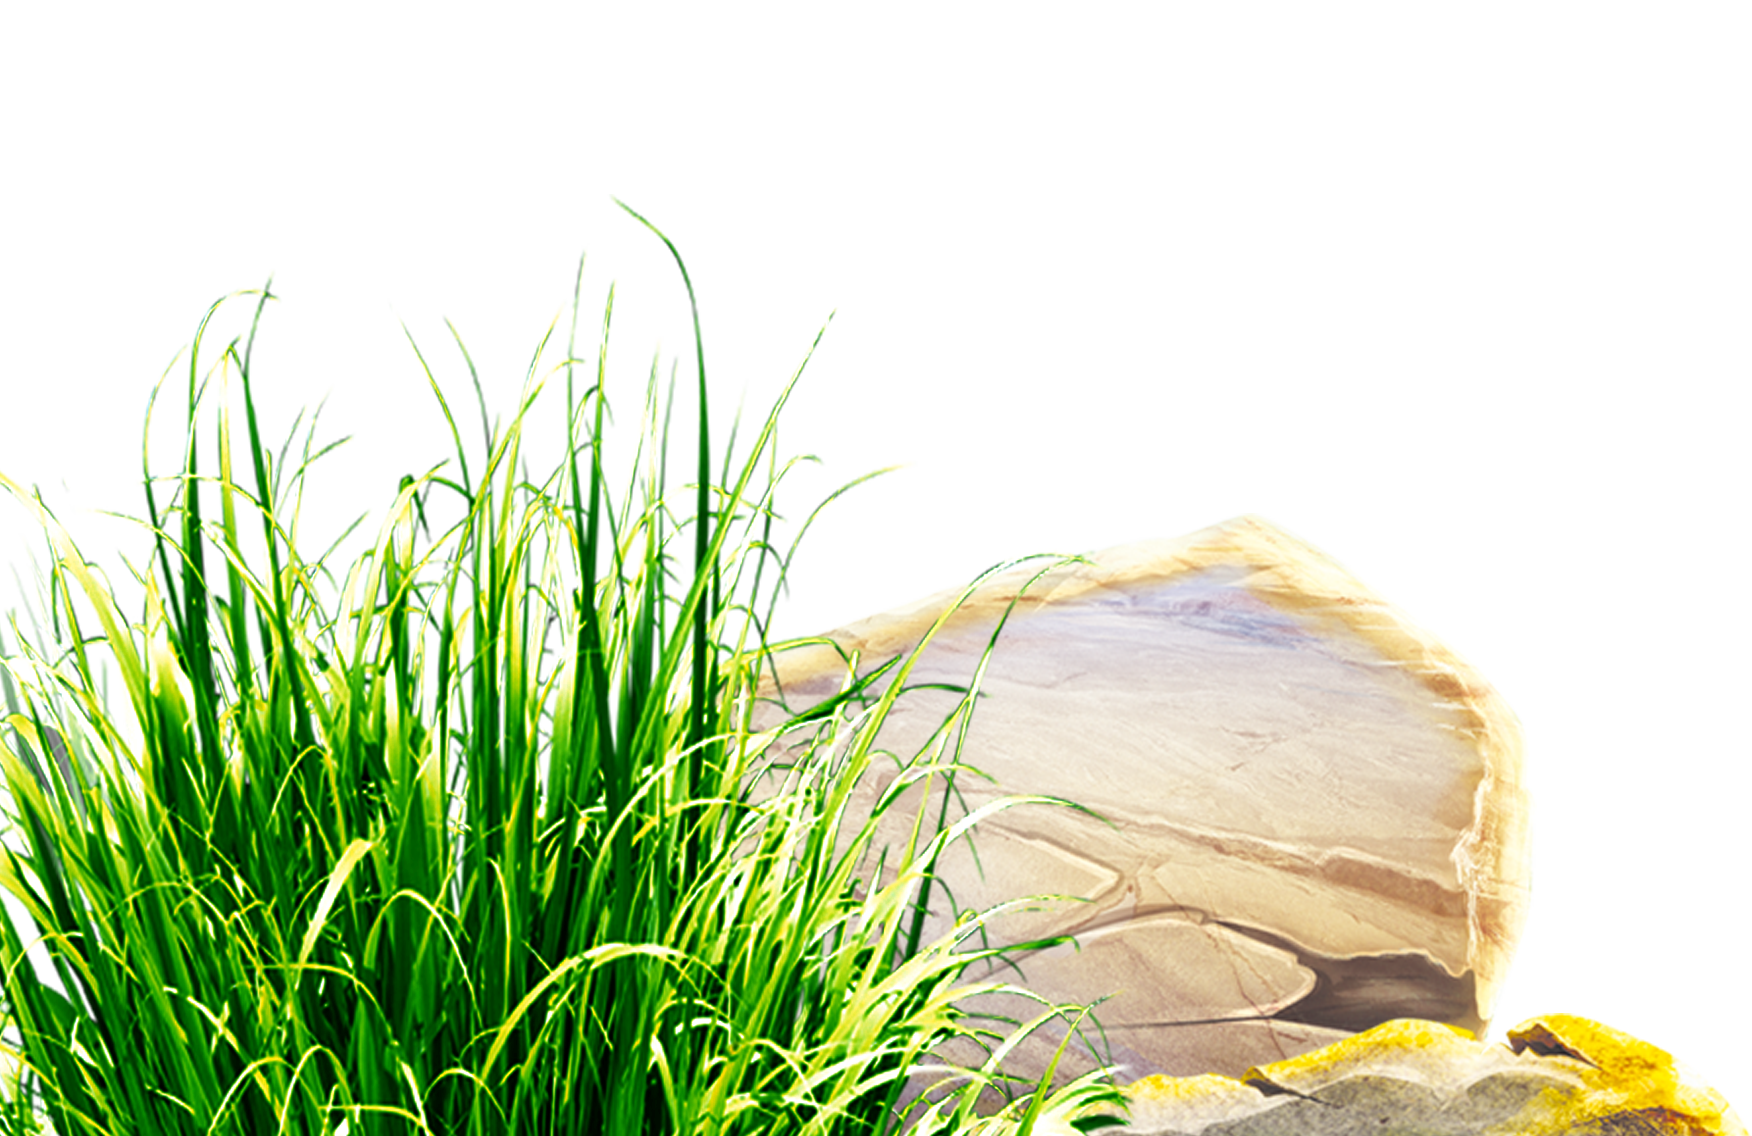 Clipart grass herbs. Download lawn clip art